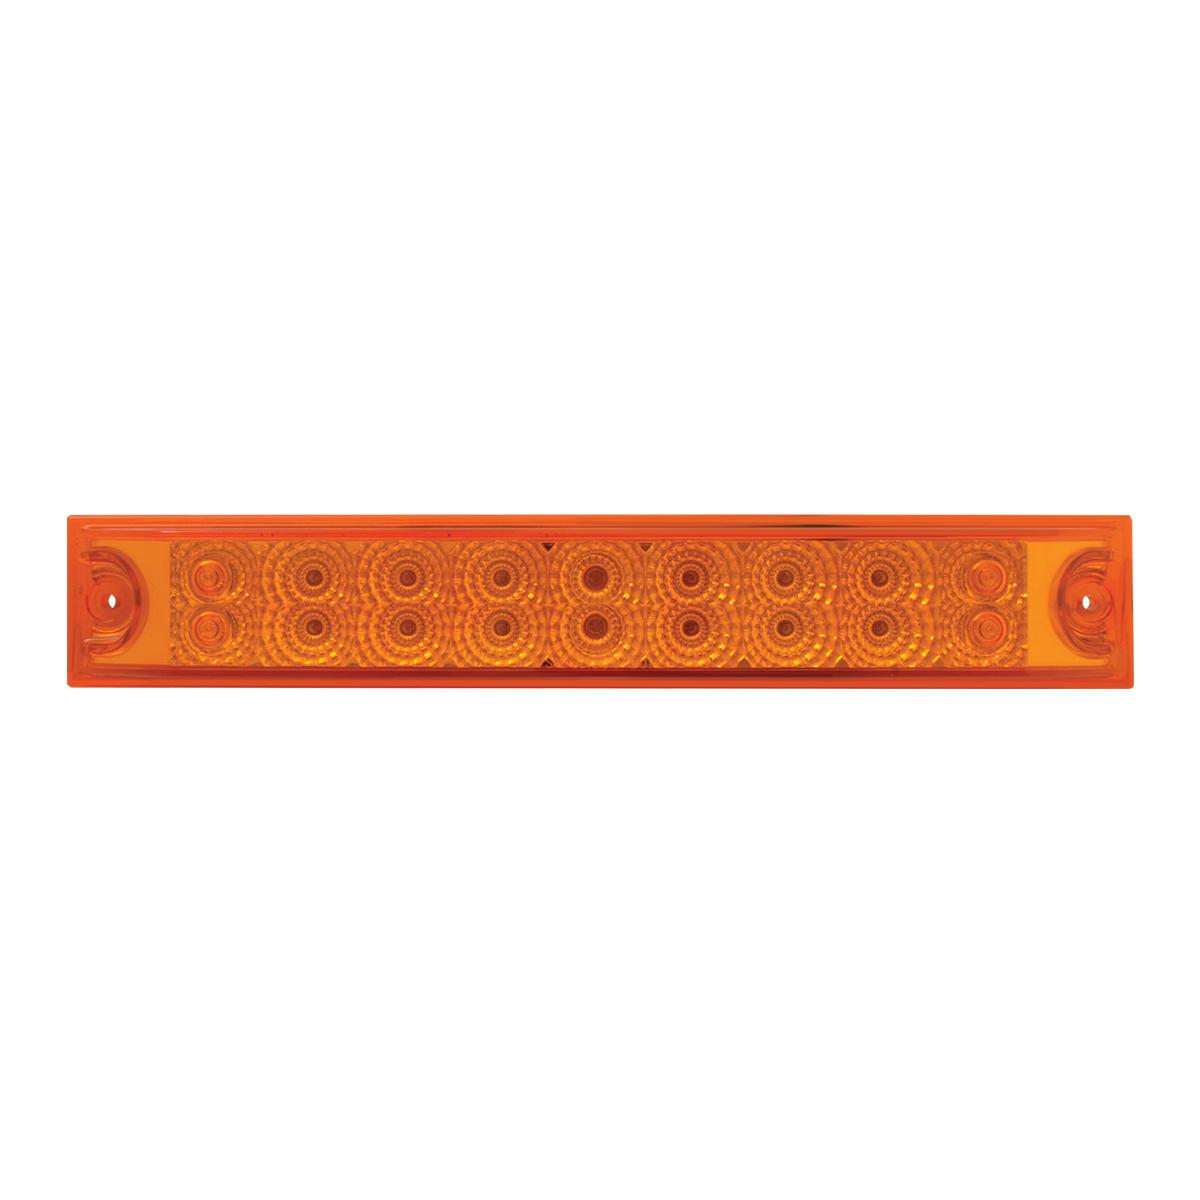 "76985 12"" Spyder LED Light Bar"